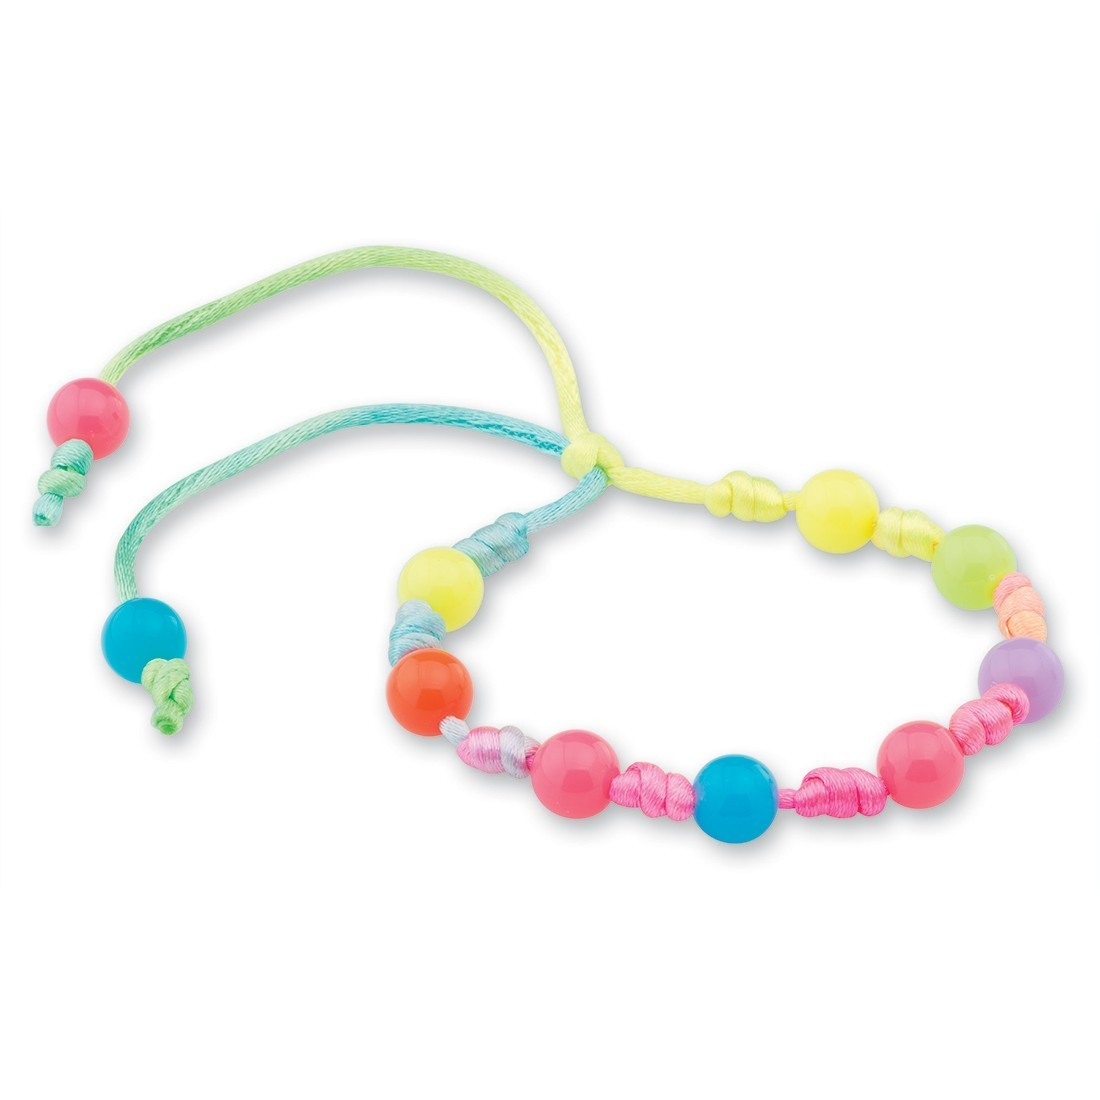 Bead Friendship Bracelets [image]